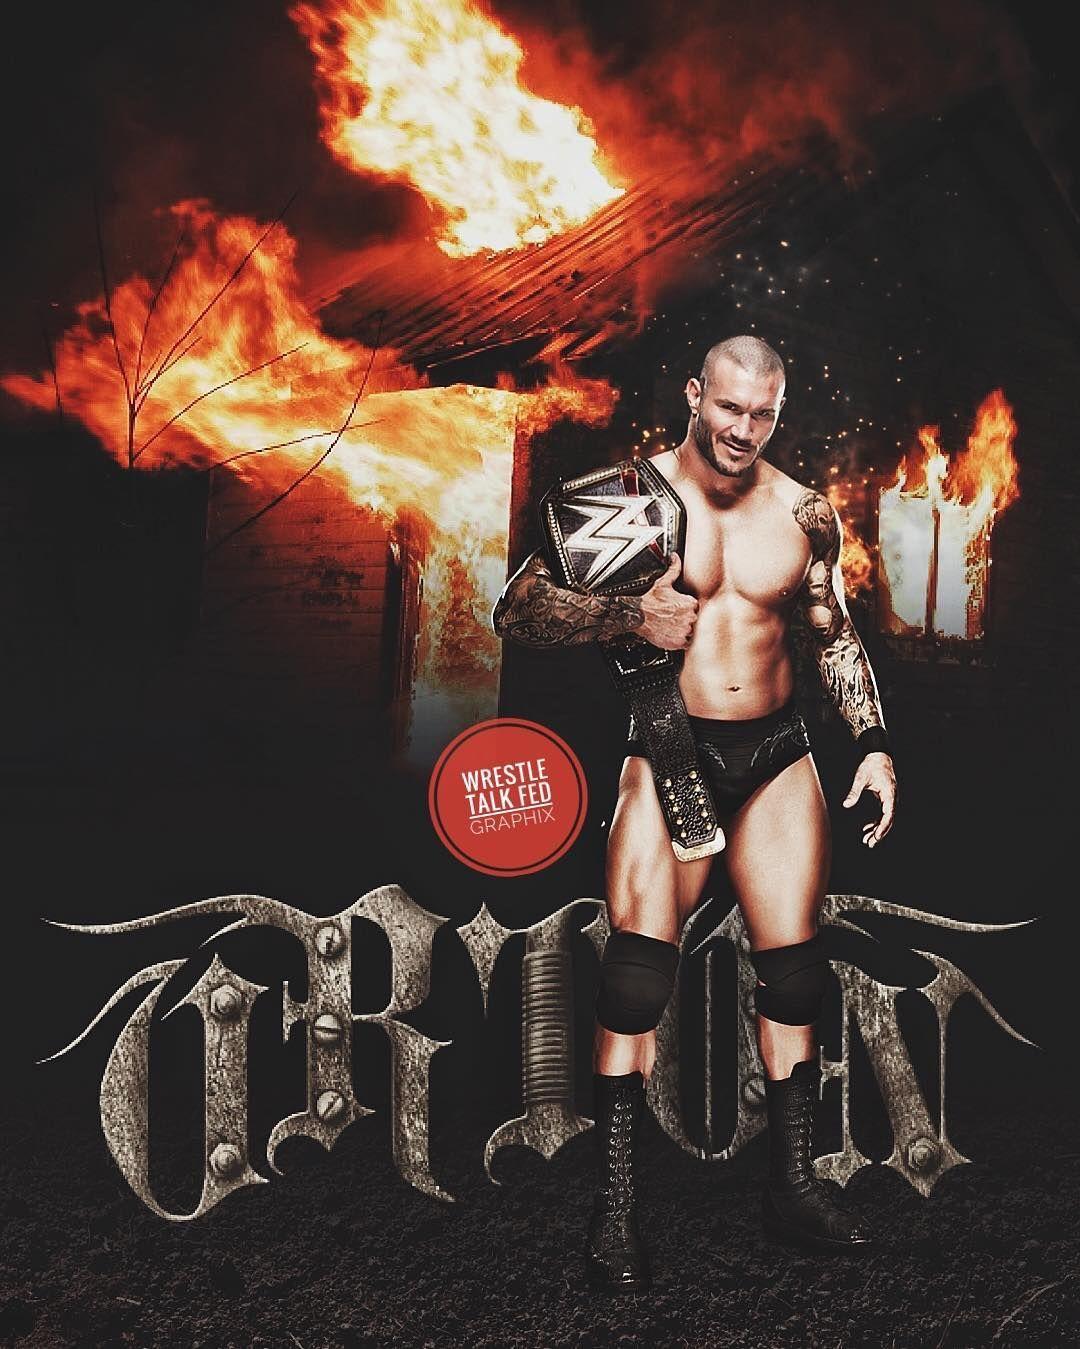 Paige WWE Signed Autographed A4 Print Photo Poster belt diva wwf psa dna tna 2